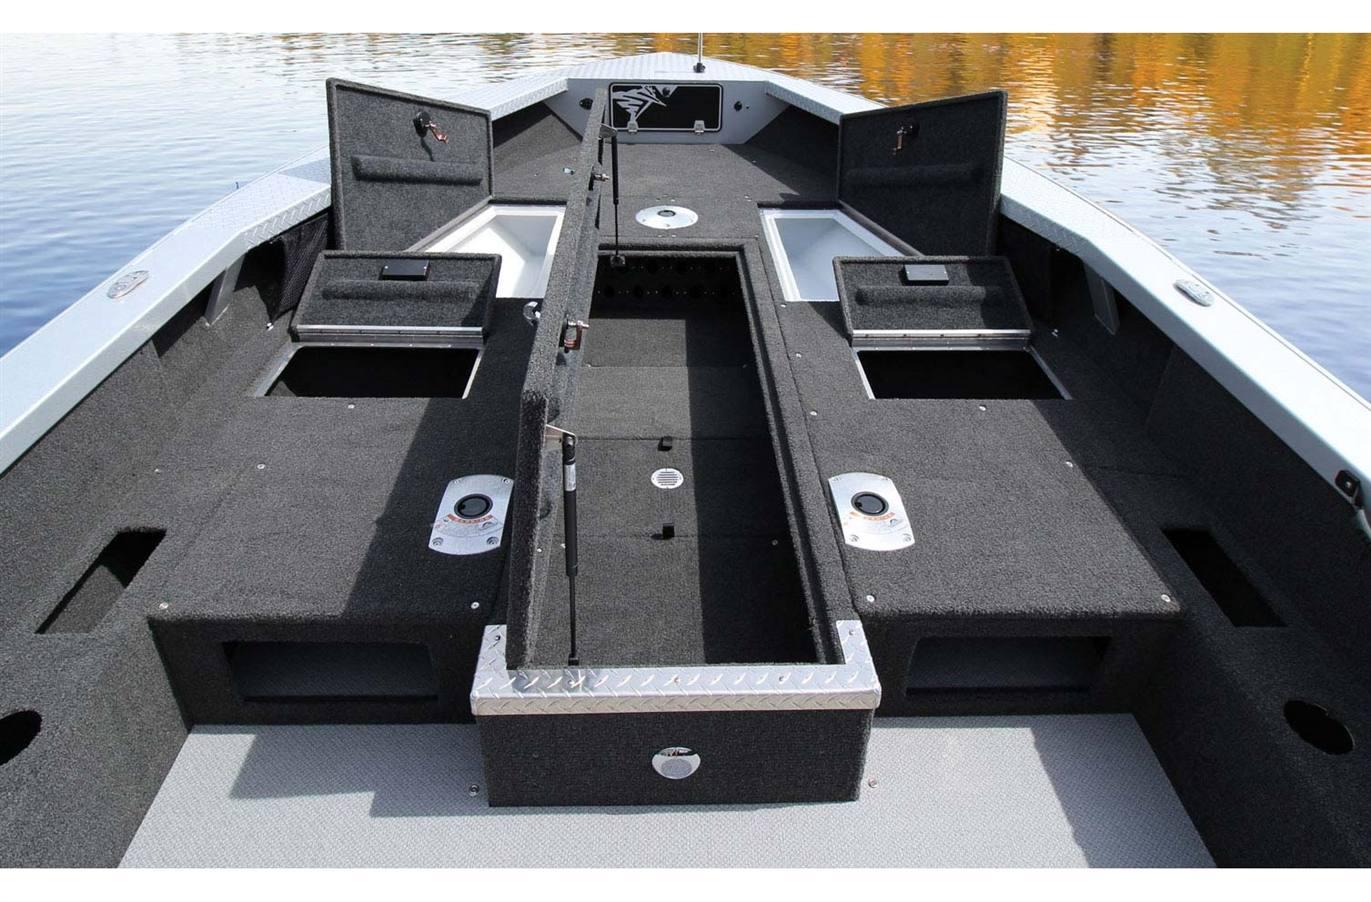 2019 Kingfisher Boats 2025 Flex Tiller XP for sale in Delano, MN